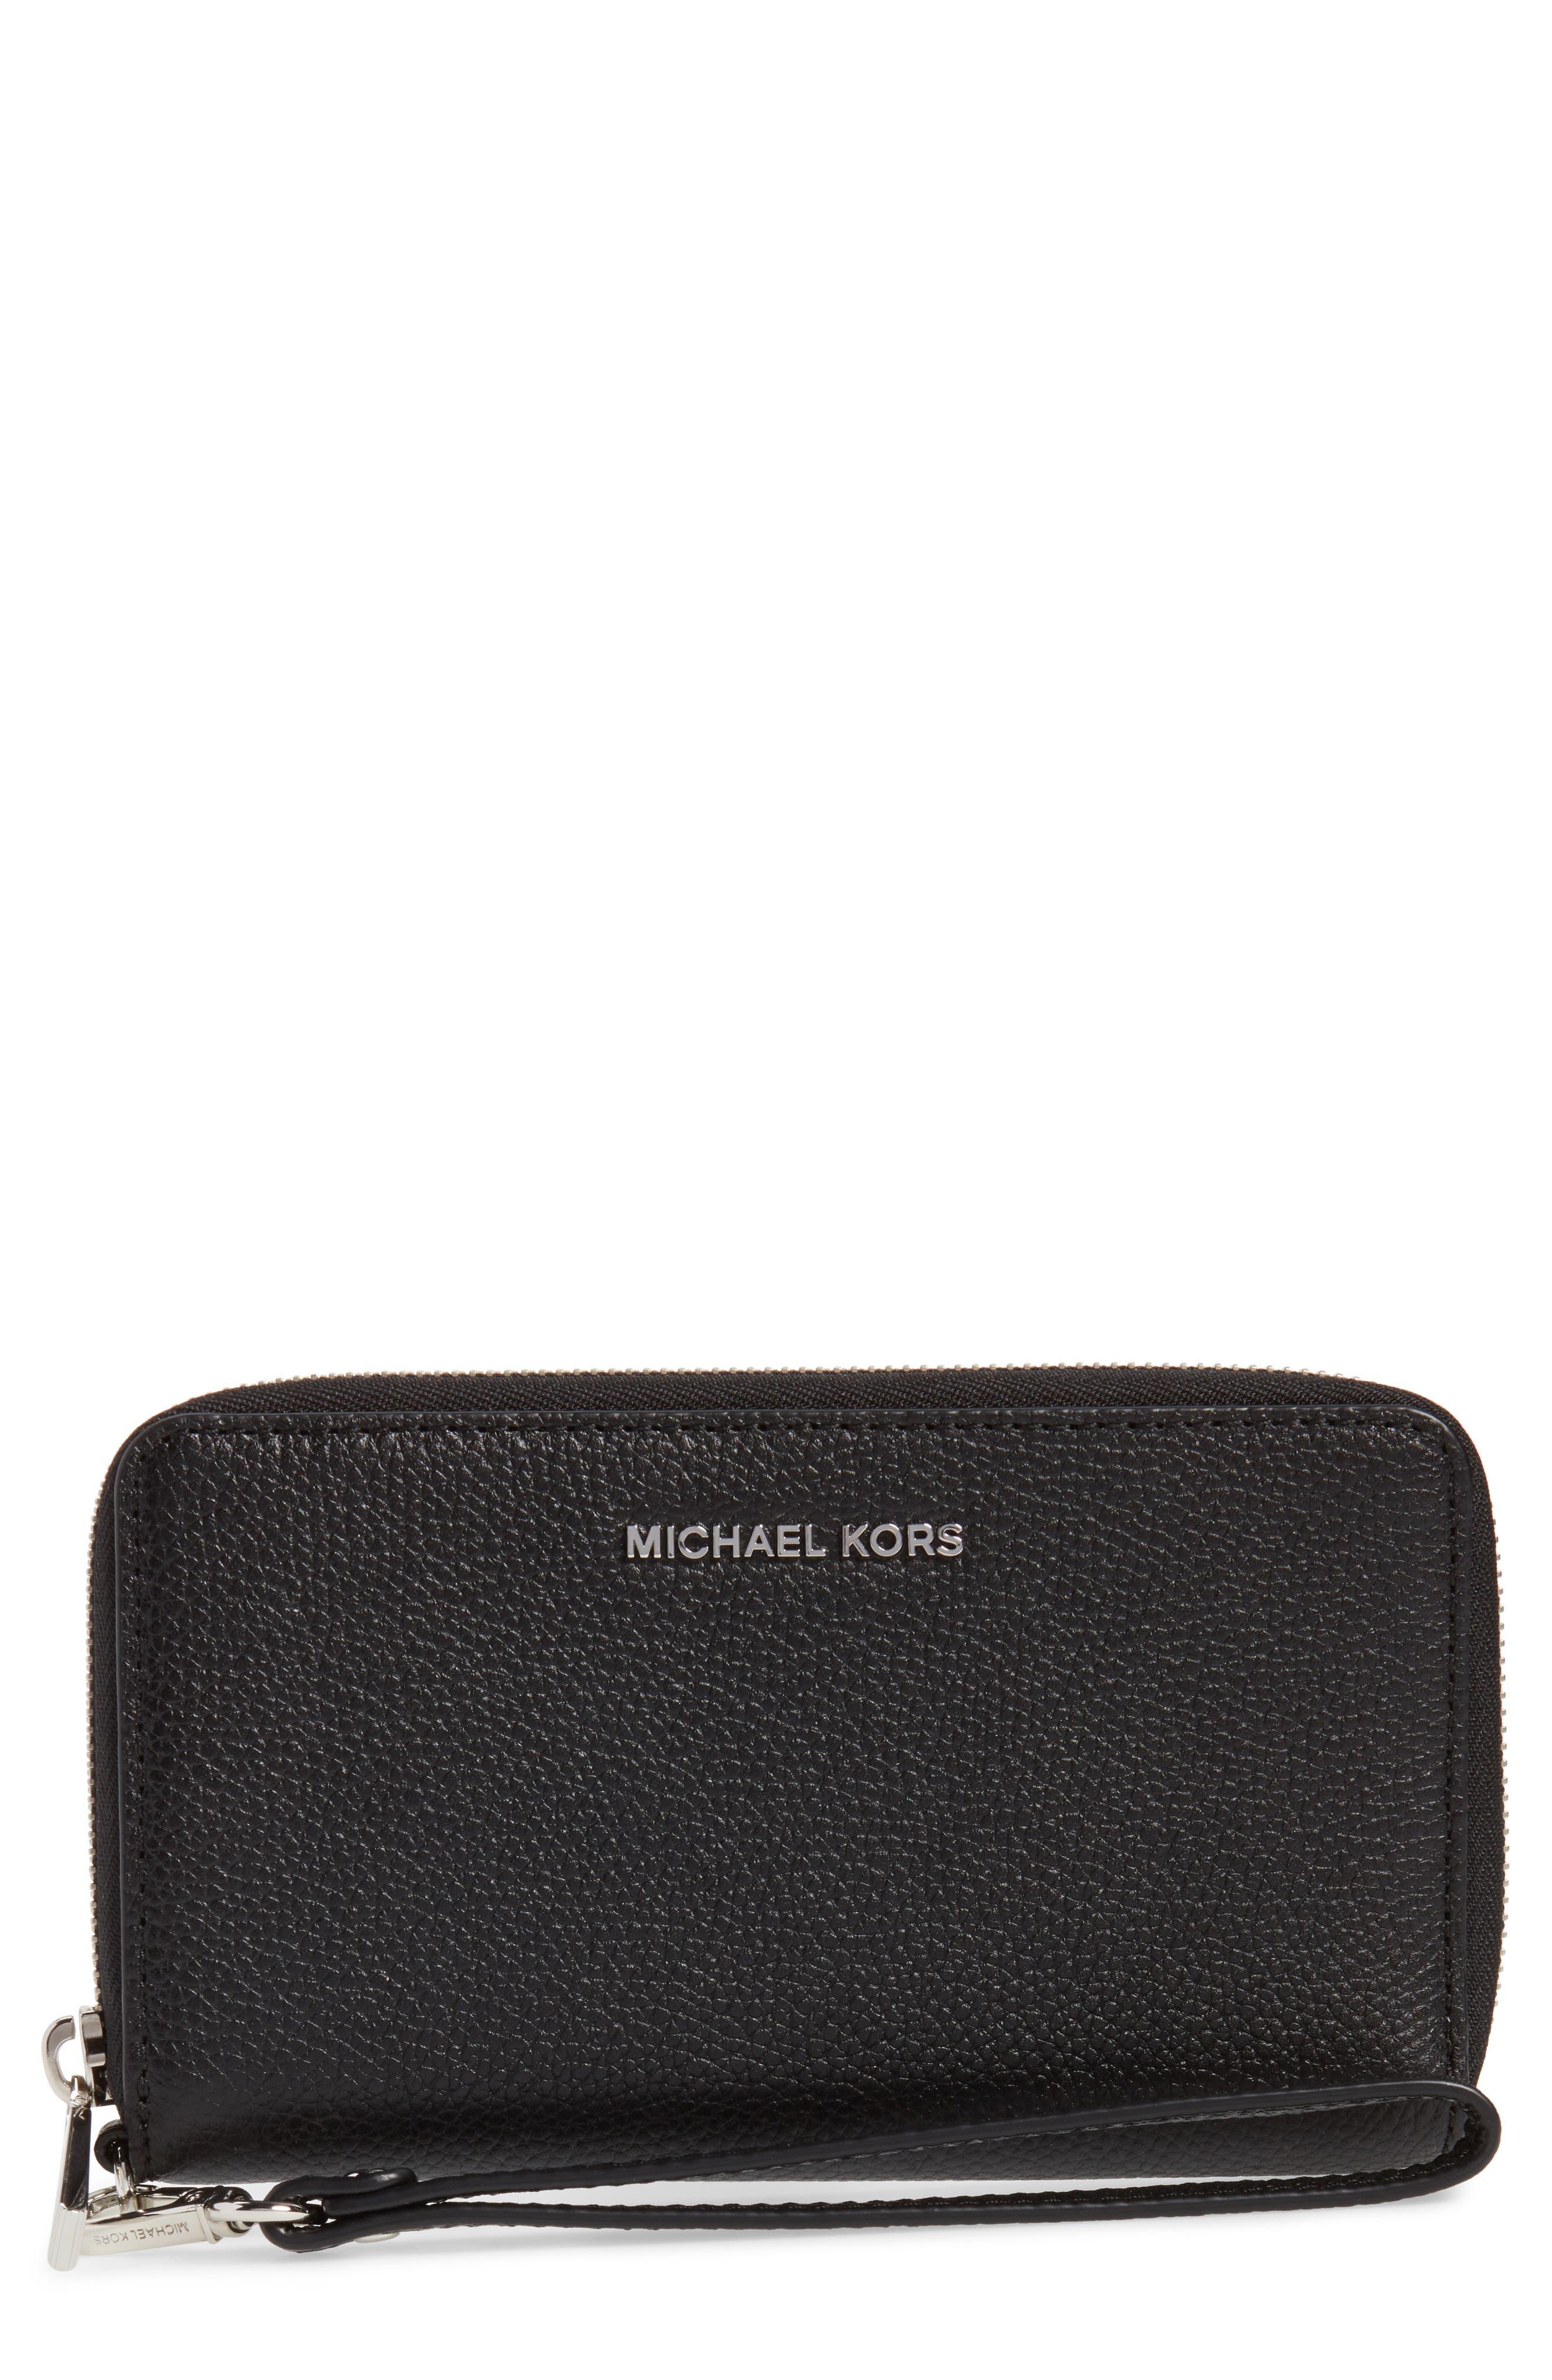 Mercer Large Leather Wristlet,                             Main thumbnail 1, color,                             Black